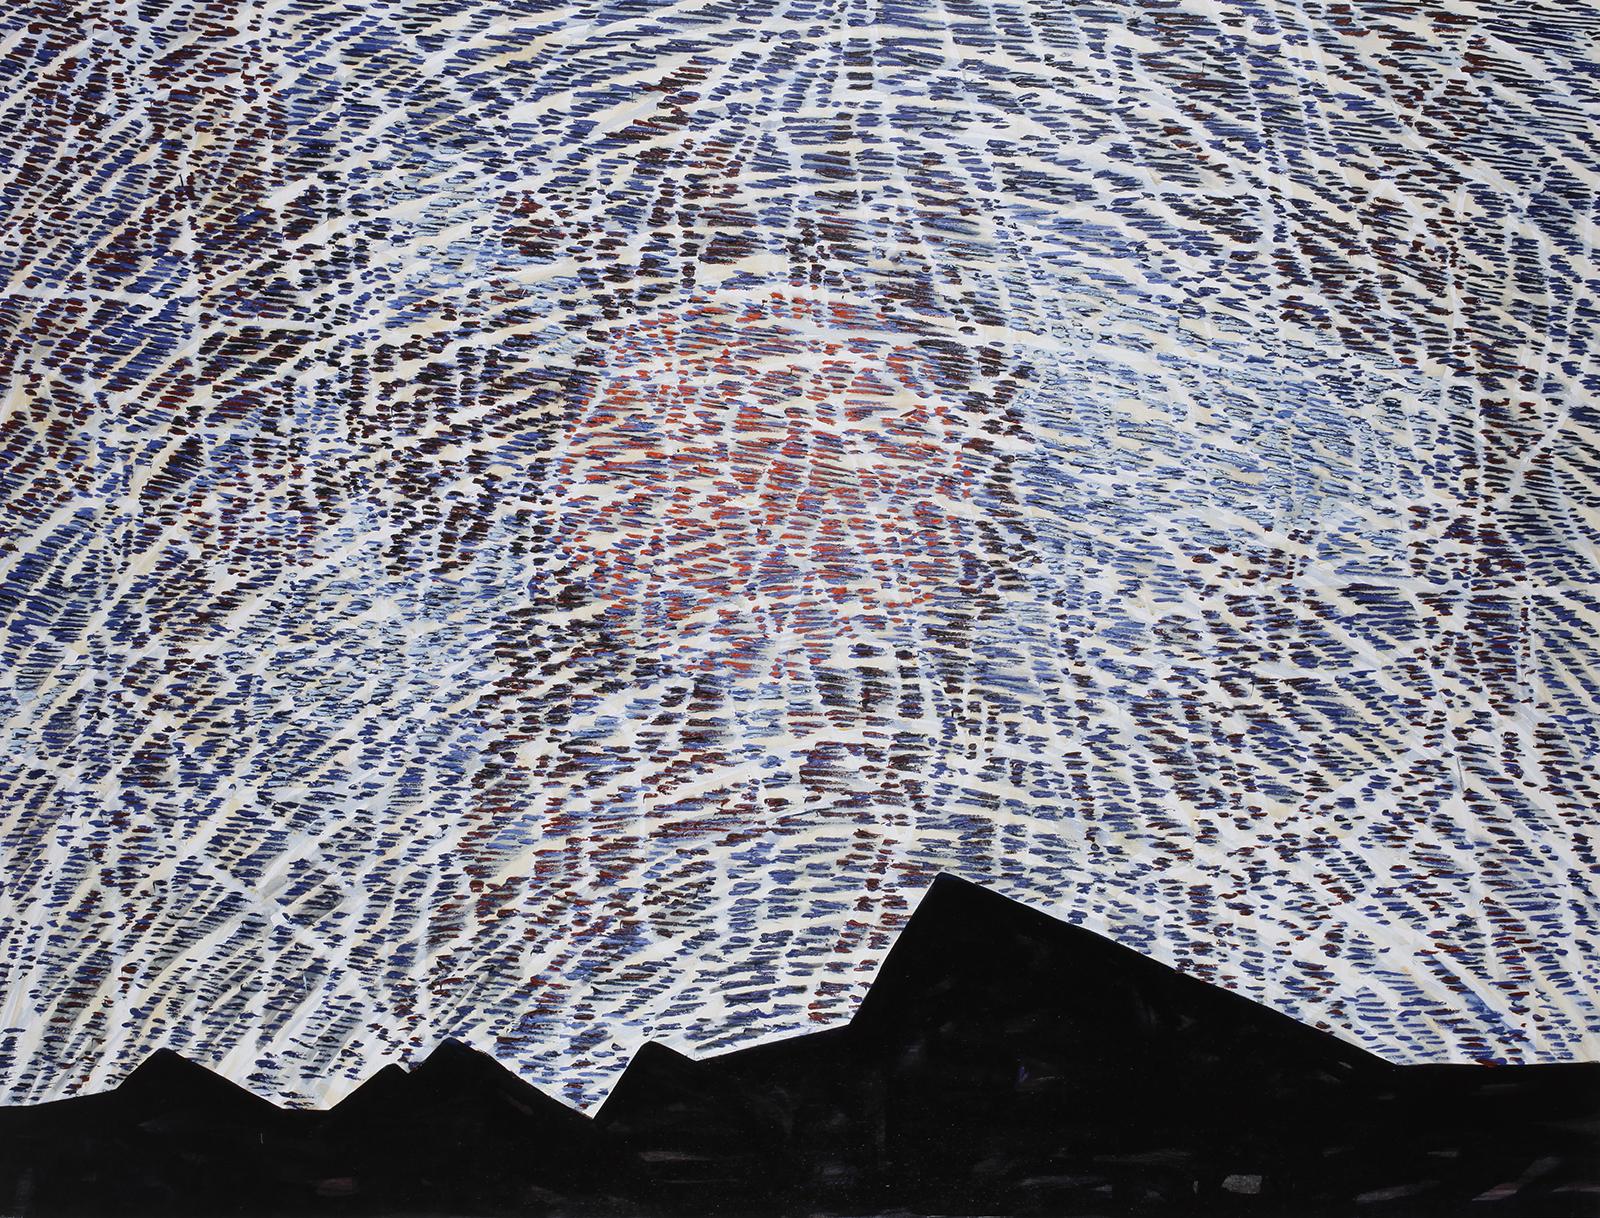 Maya Cohen Levy / Nocturnal Sights VI